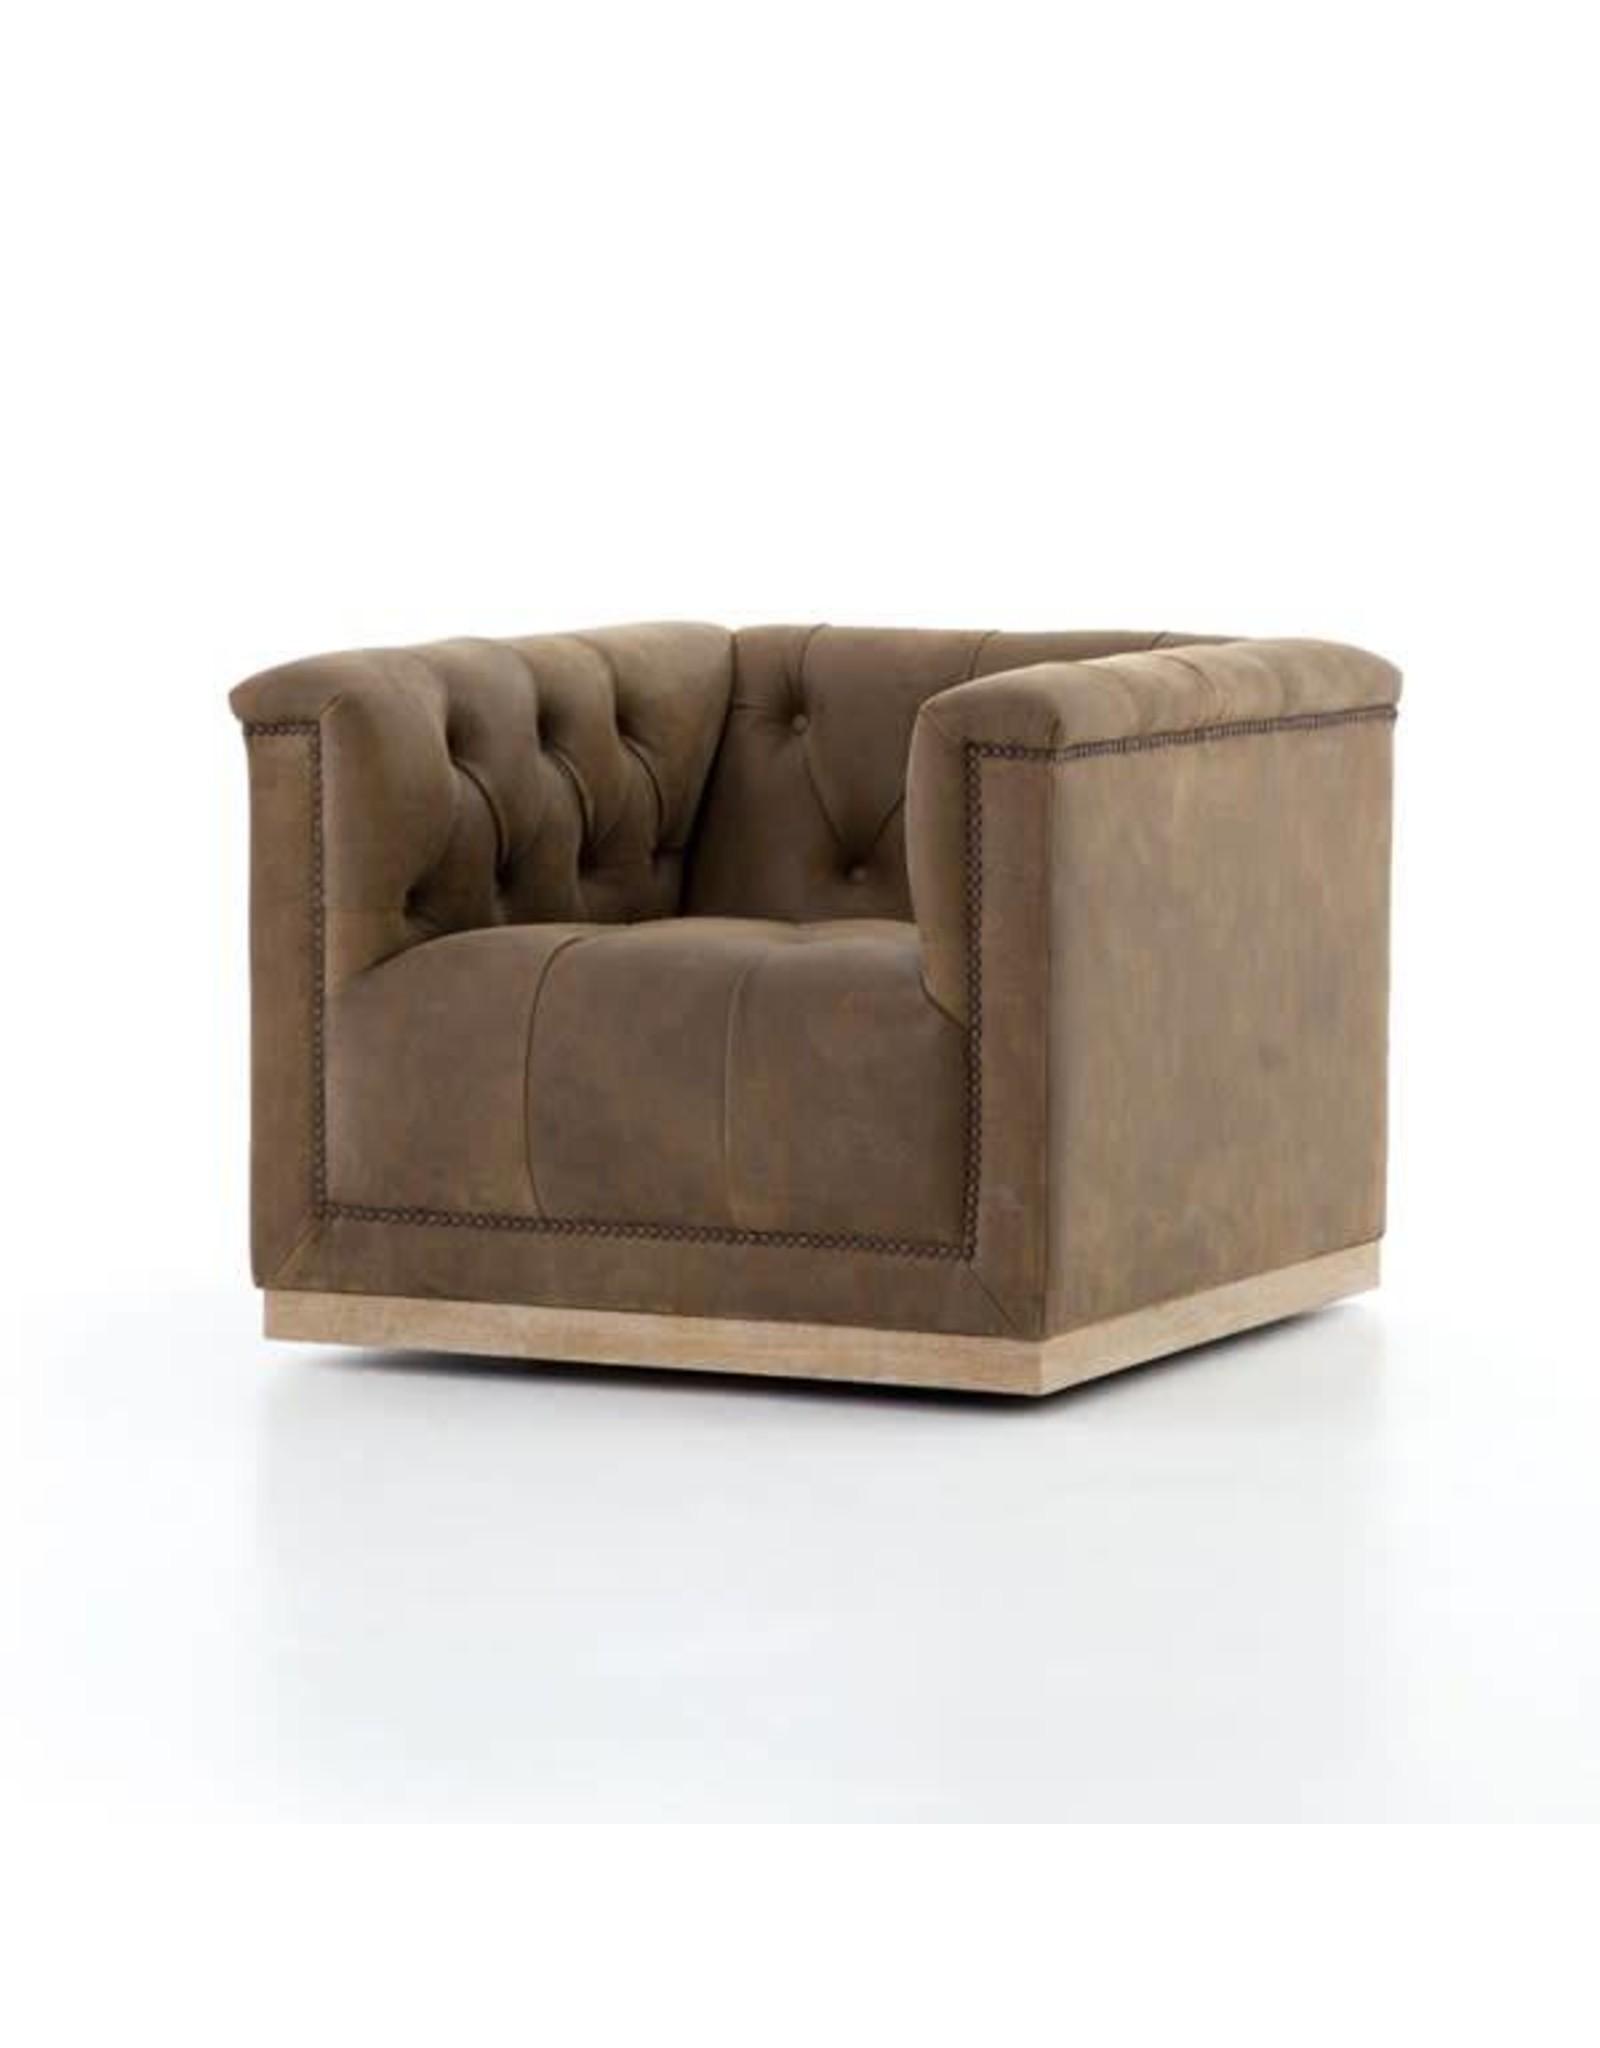 Maxx Swivel Chair-Umber Grey